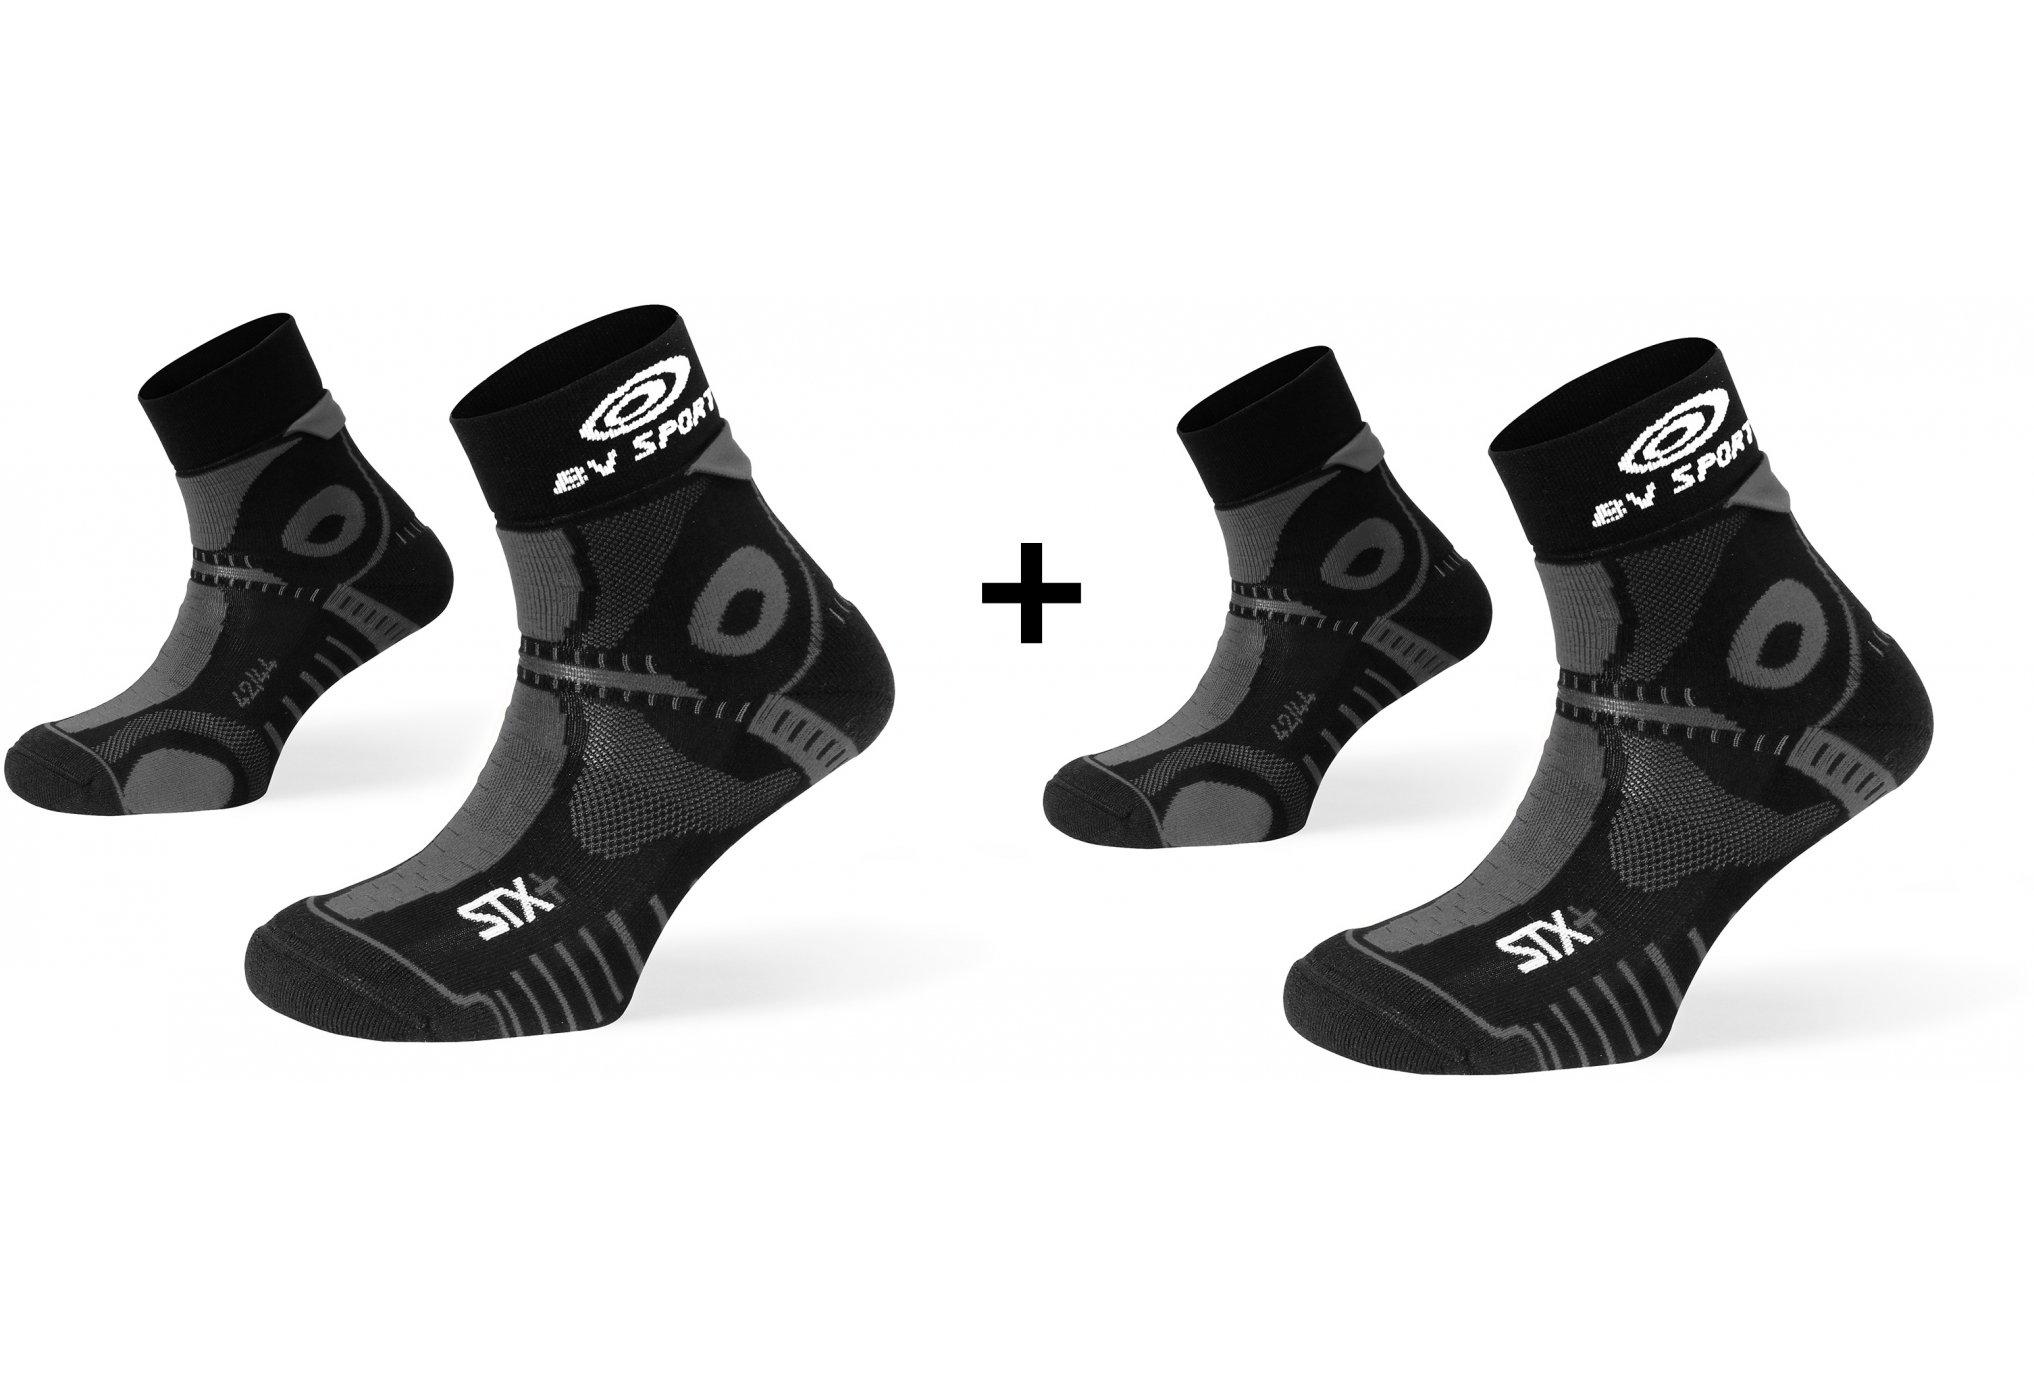 BV Sport Pack STX+ Evo Chaussettes